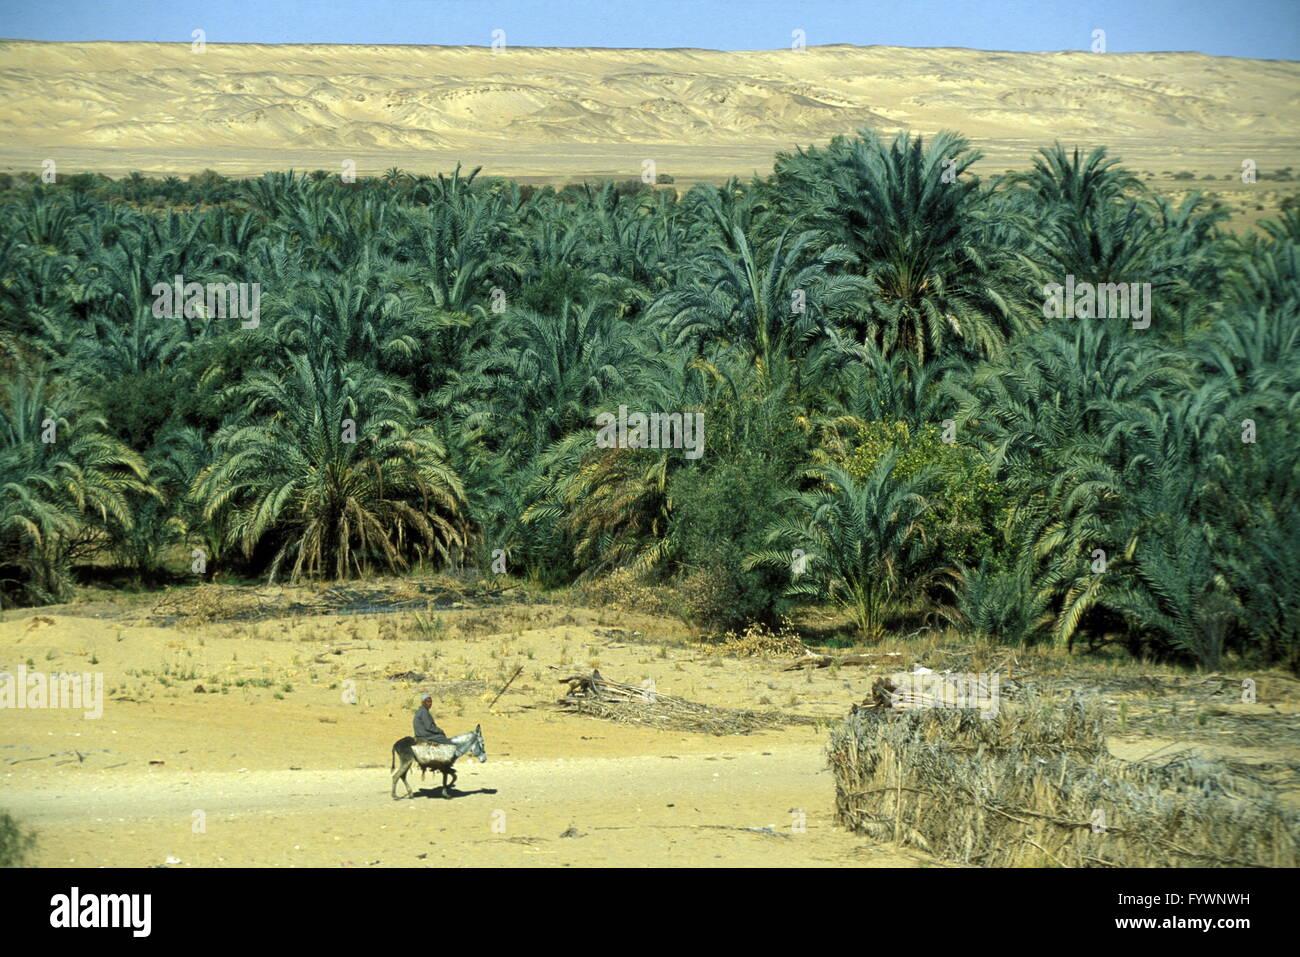 AFRICA EGYPT SAHARA SIWA OASIS - Stock Image